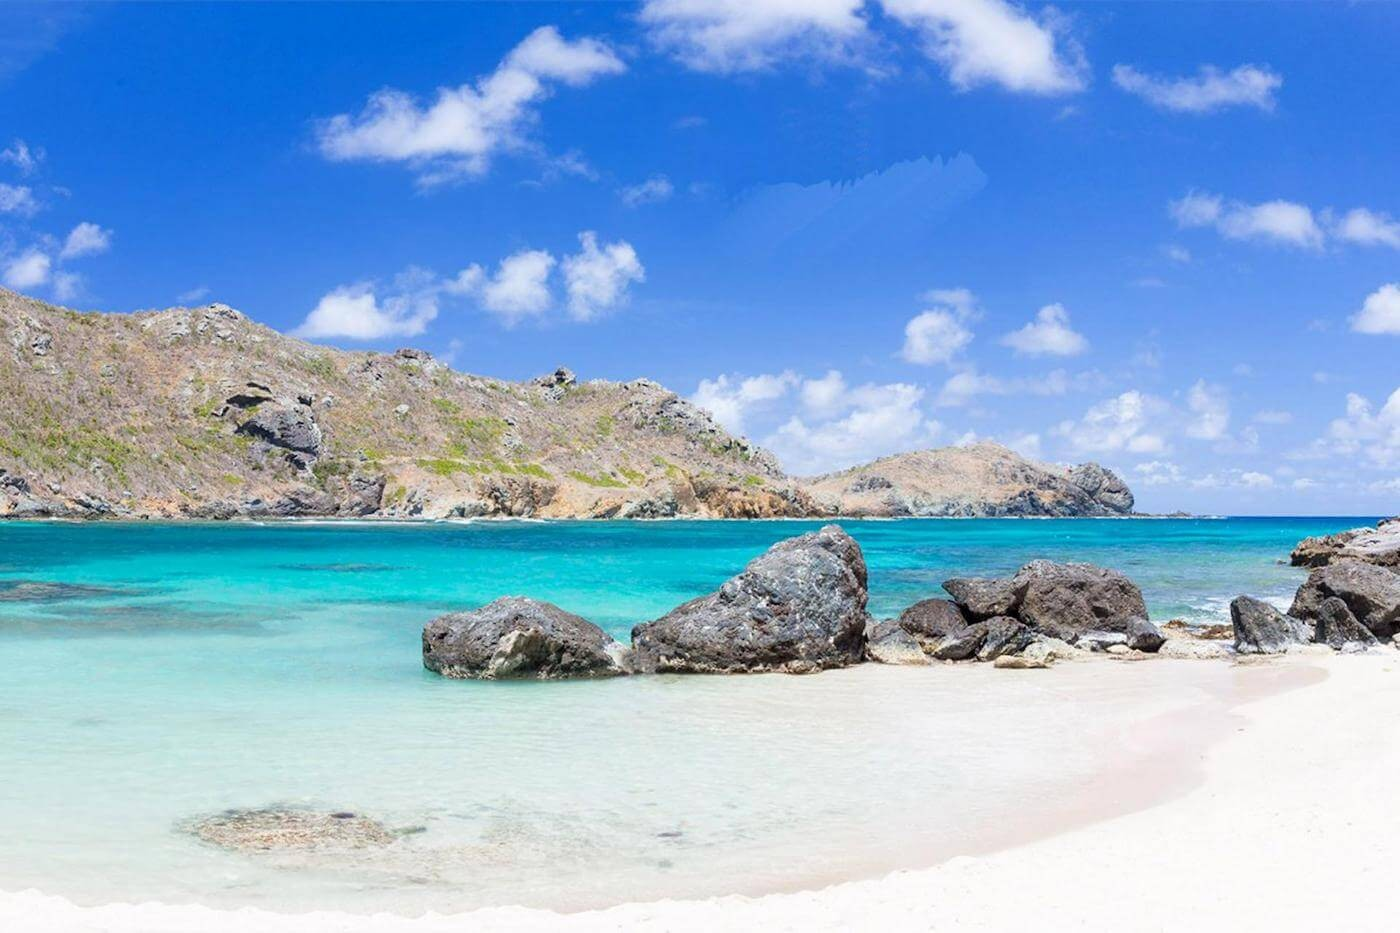 petite-anse-beach